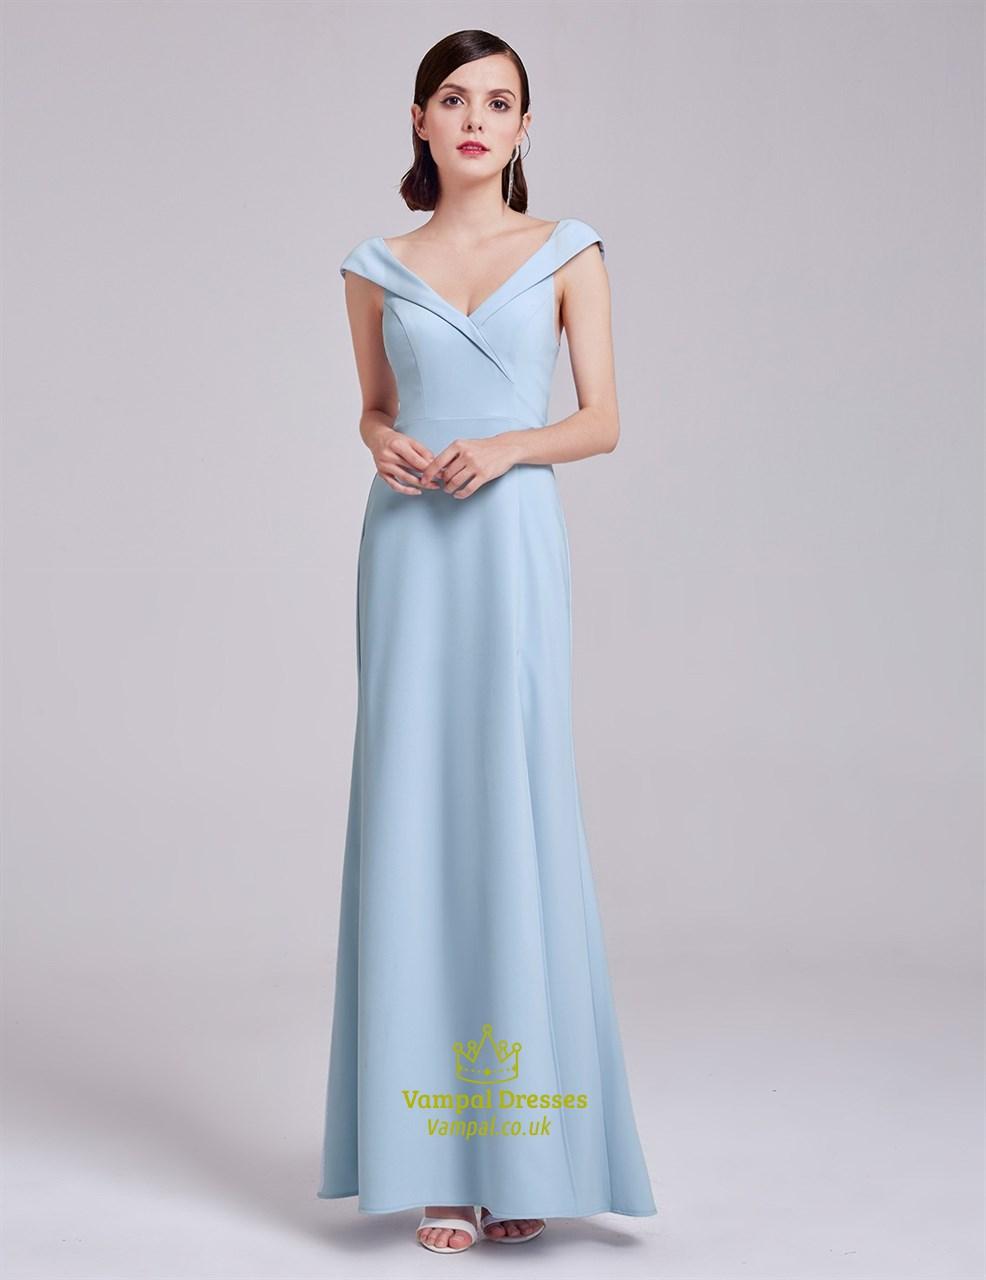 59b75a44bfa Elegant Light Blue Cap Sleeve V Neck Long Evening Dress With V-Back SKU  -FS2902